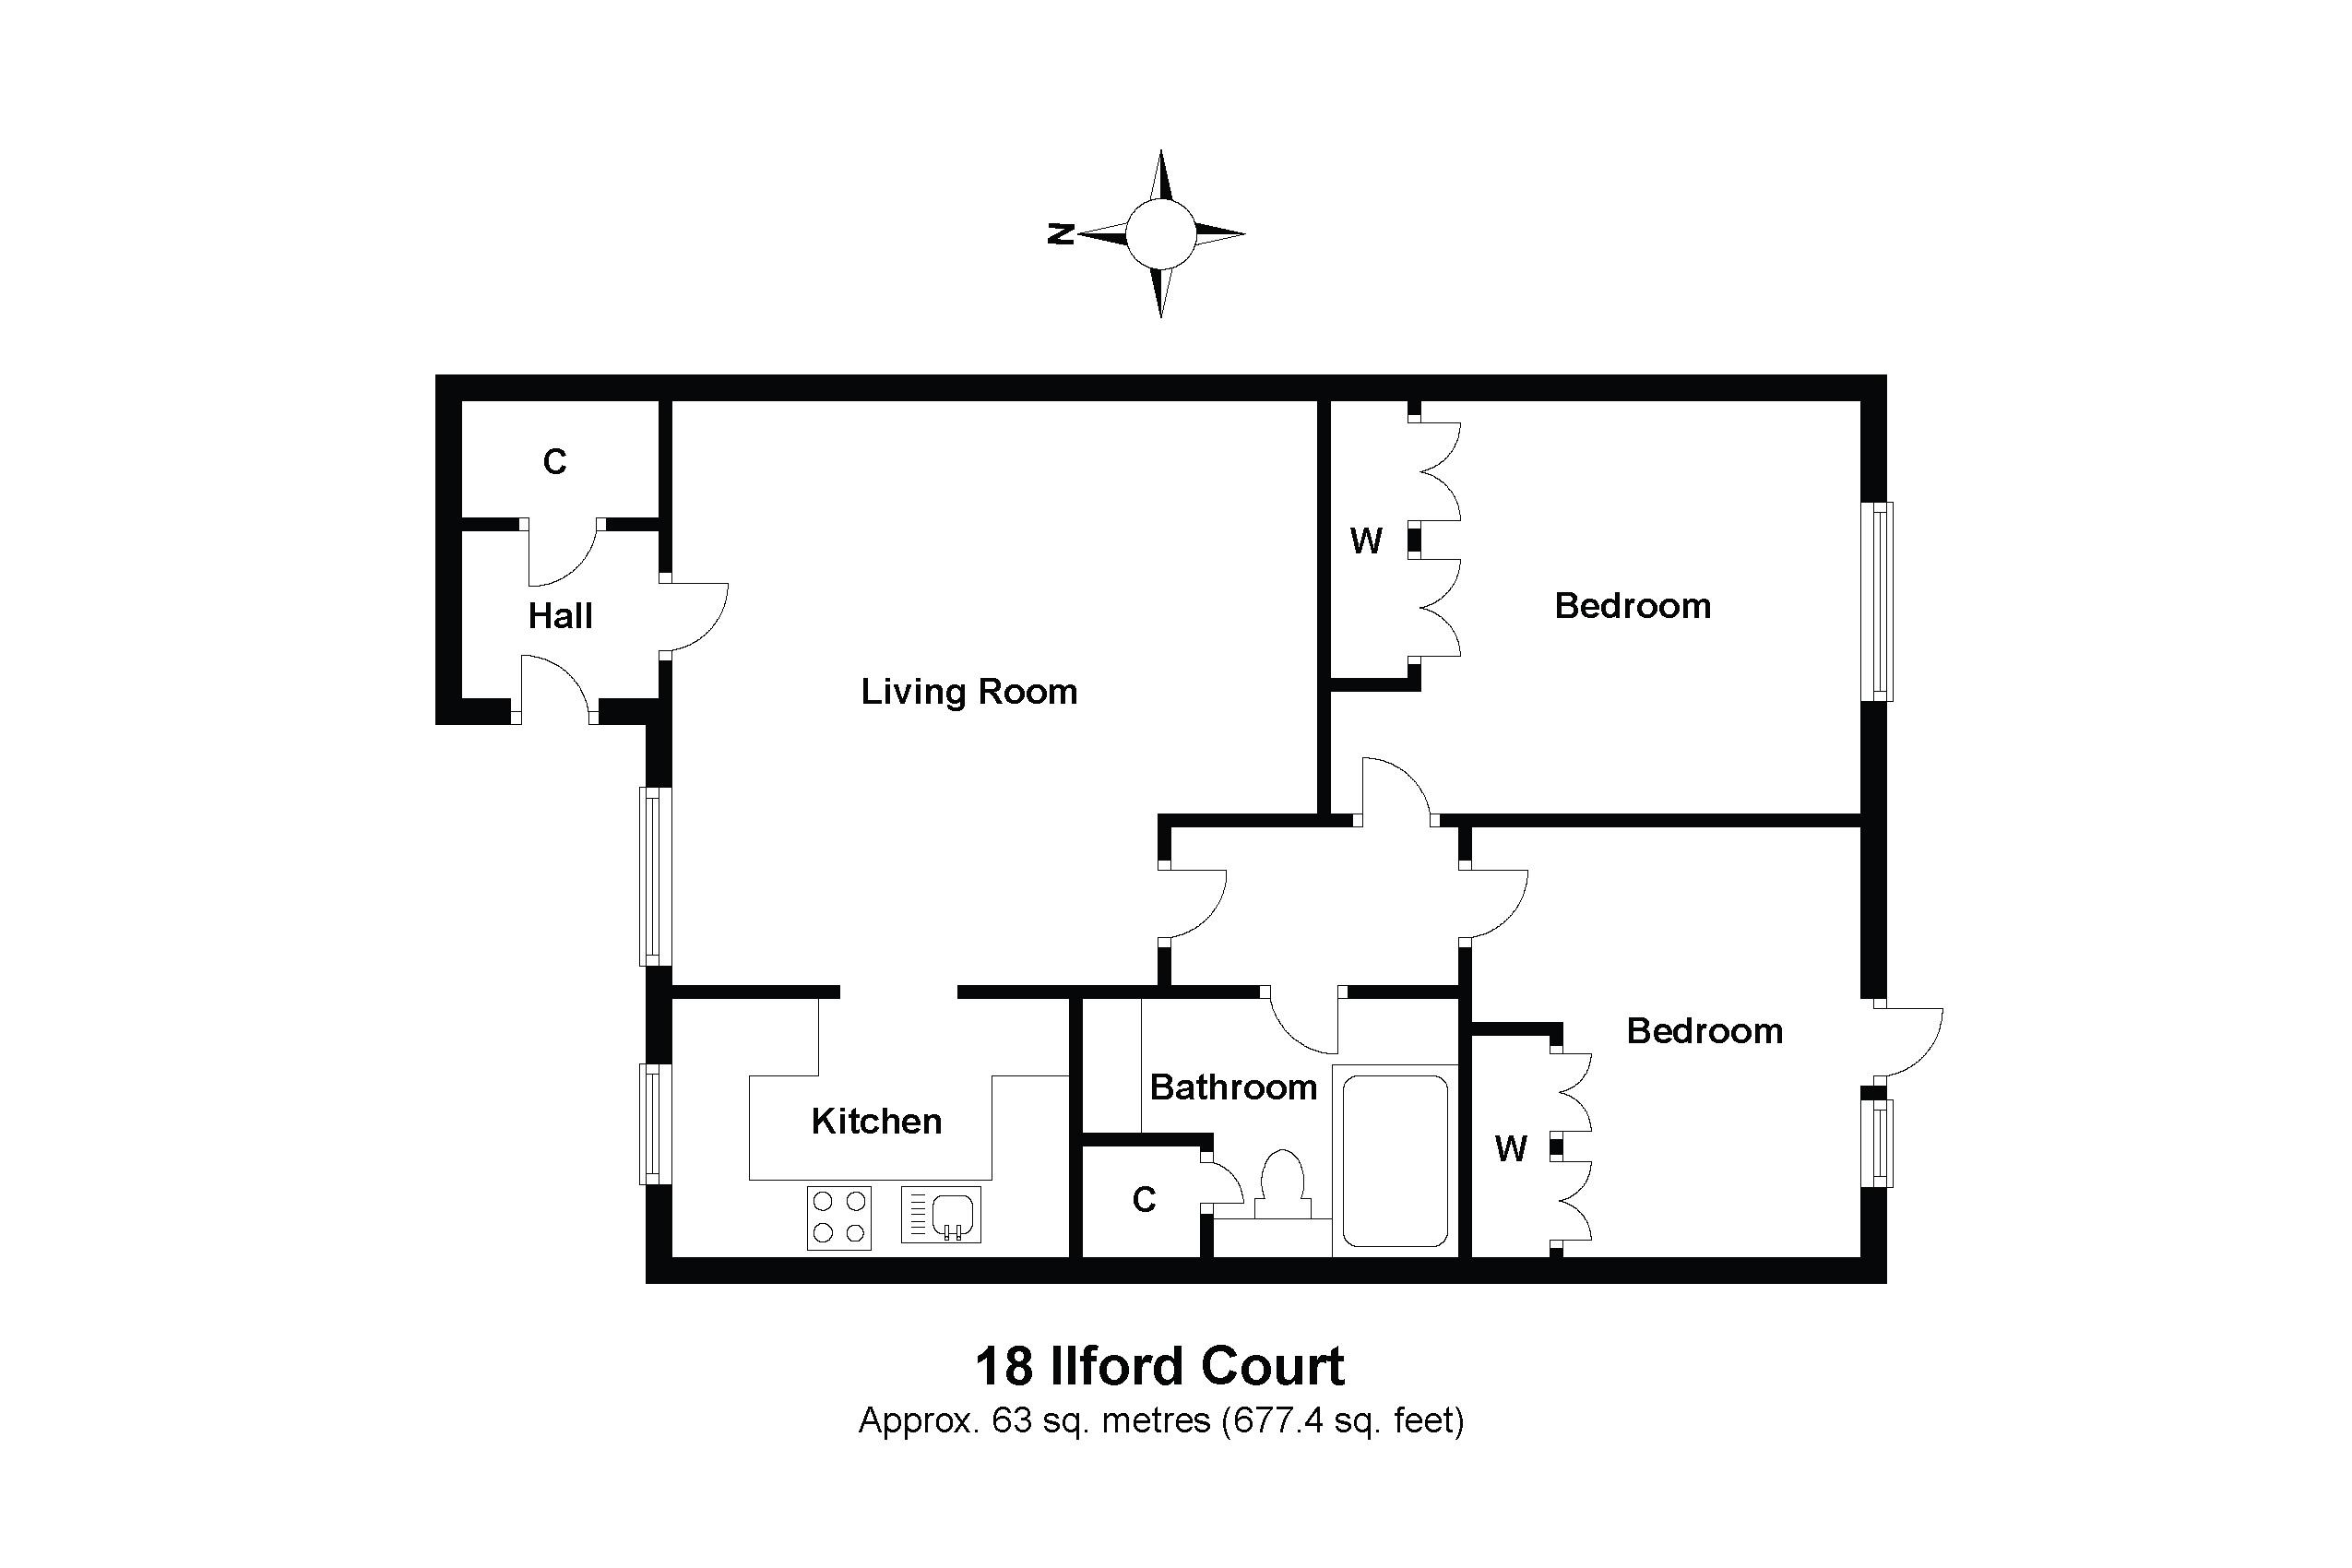 18 Ilford Court Floorplan